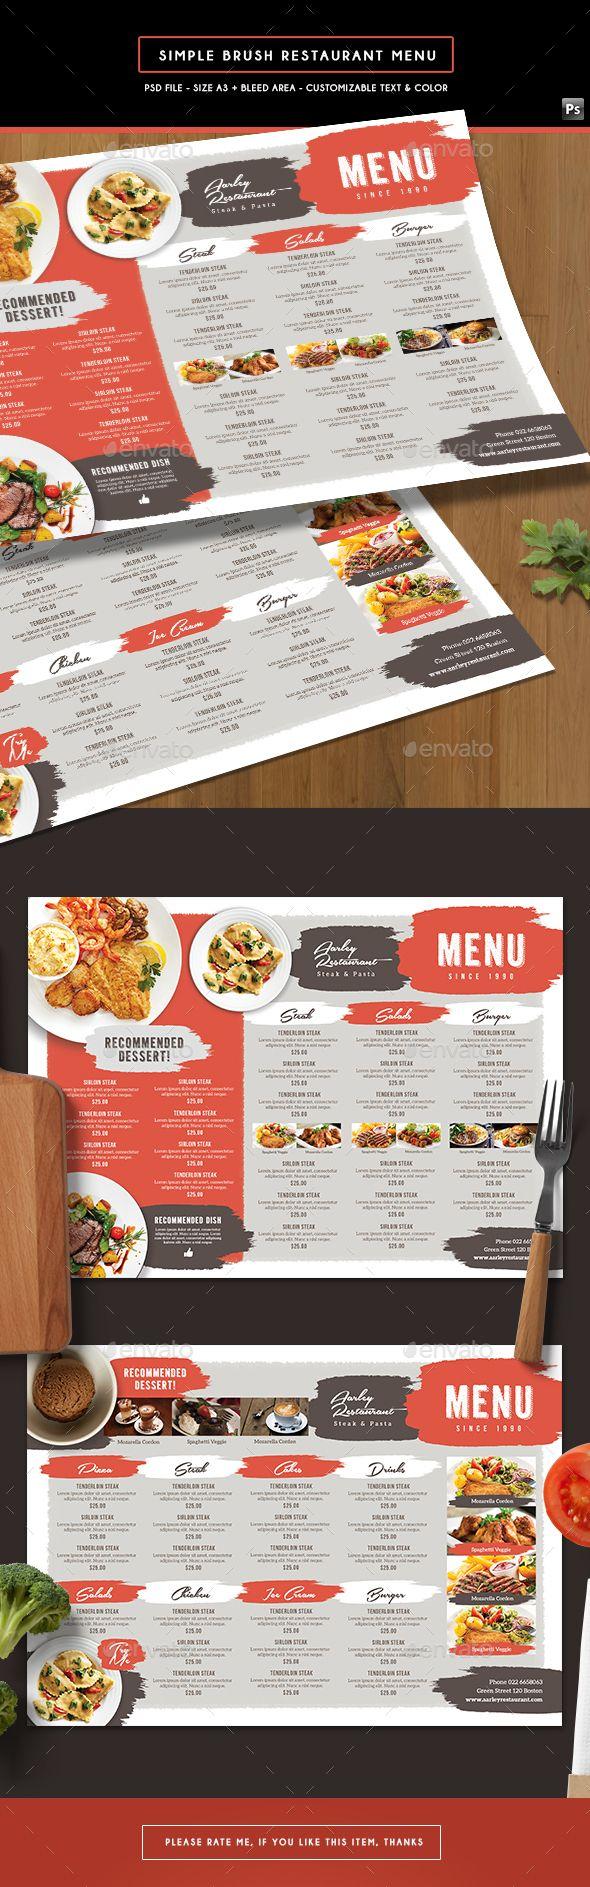 Simple Brush Restaurant Menu Board Template PSD